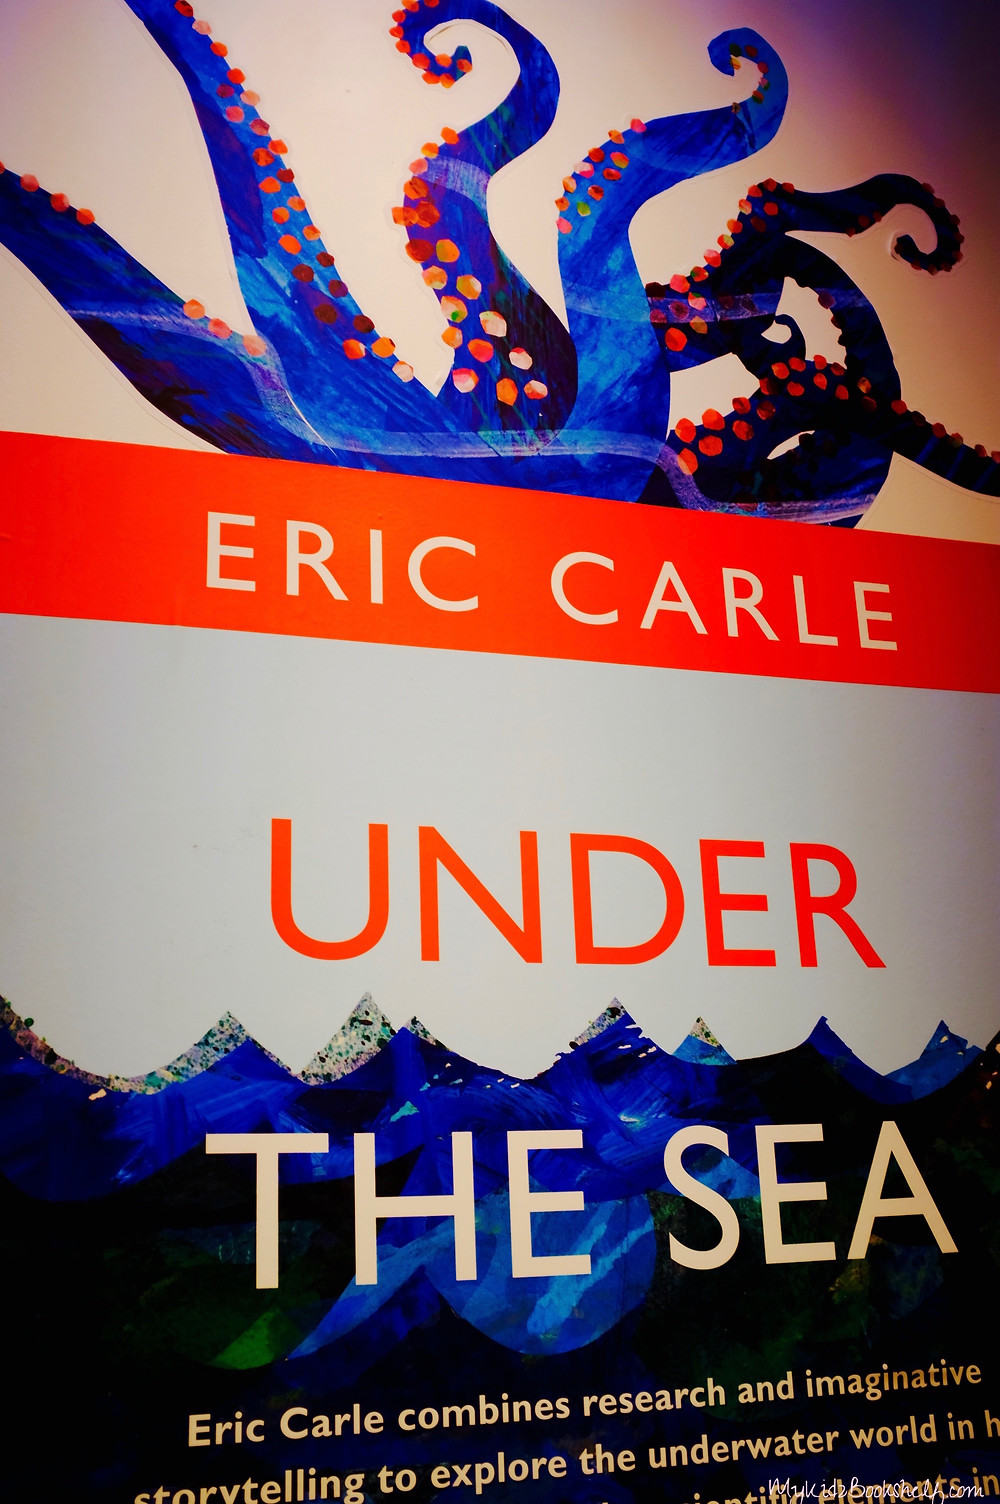 Eric-Carle-Under-the-Sea-Exhbit-mural